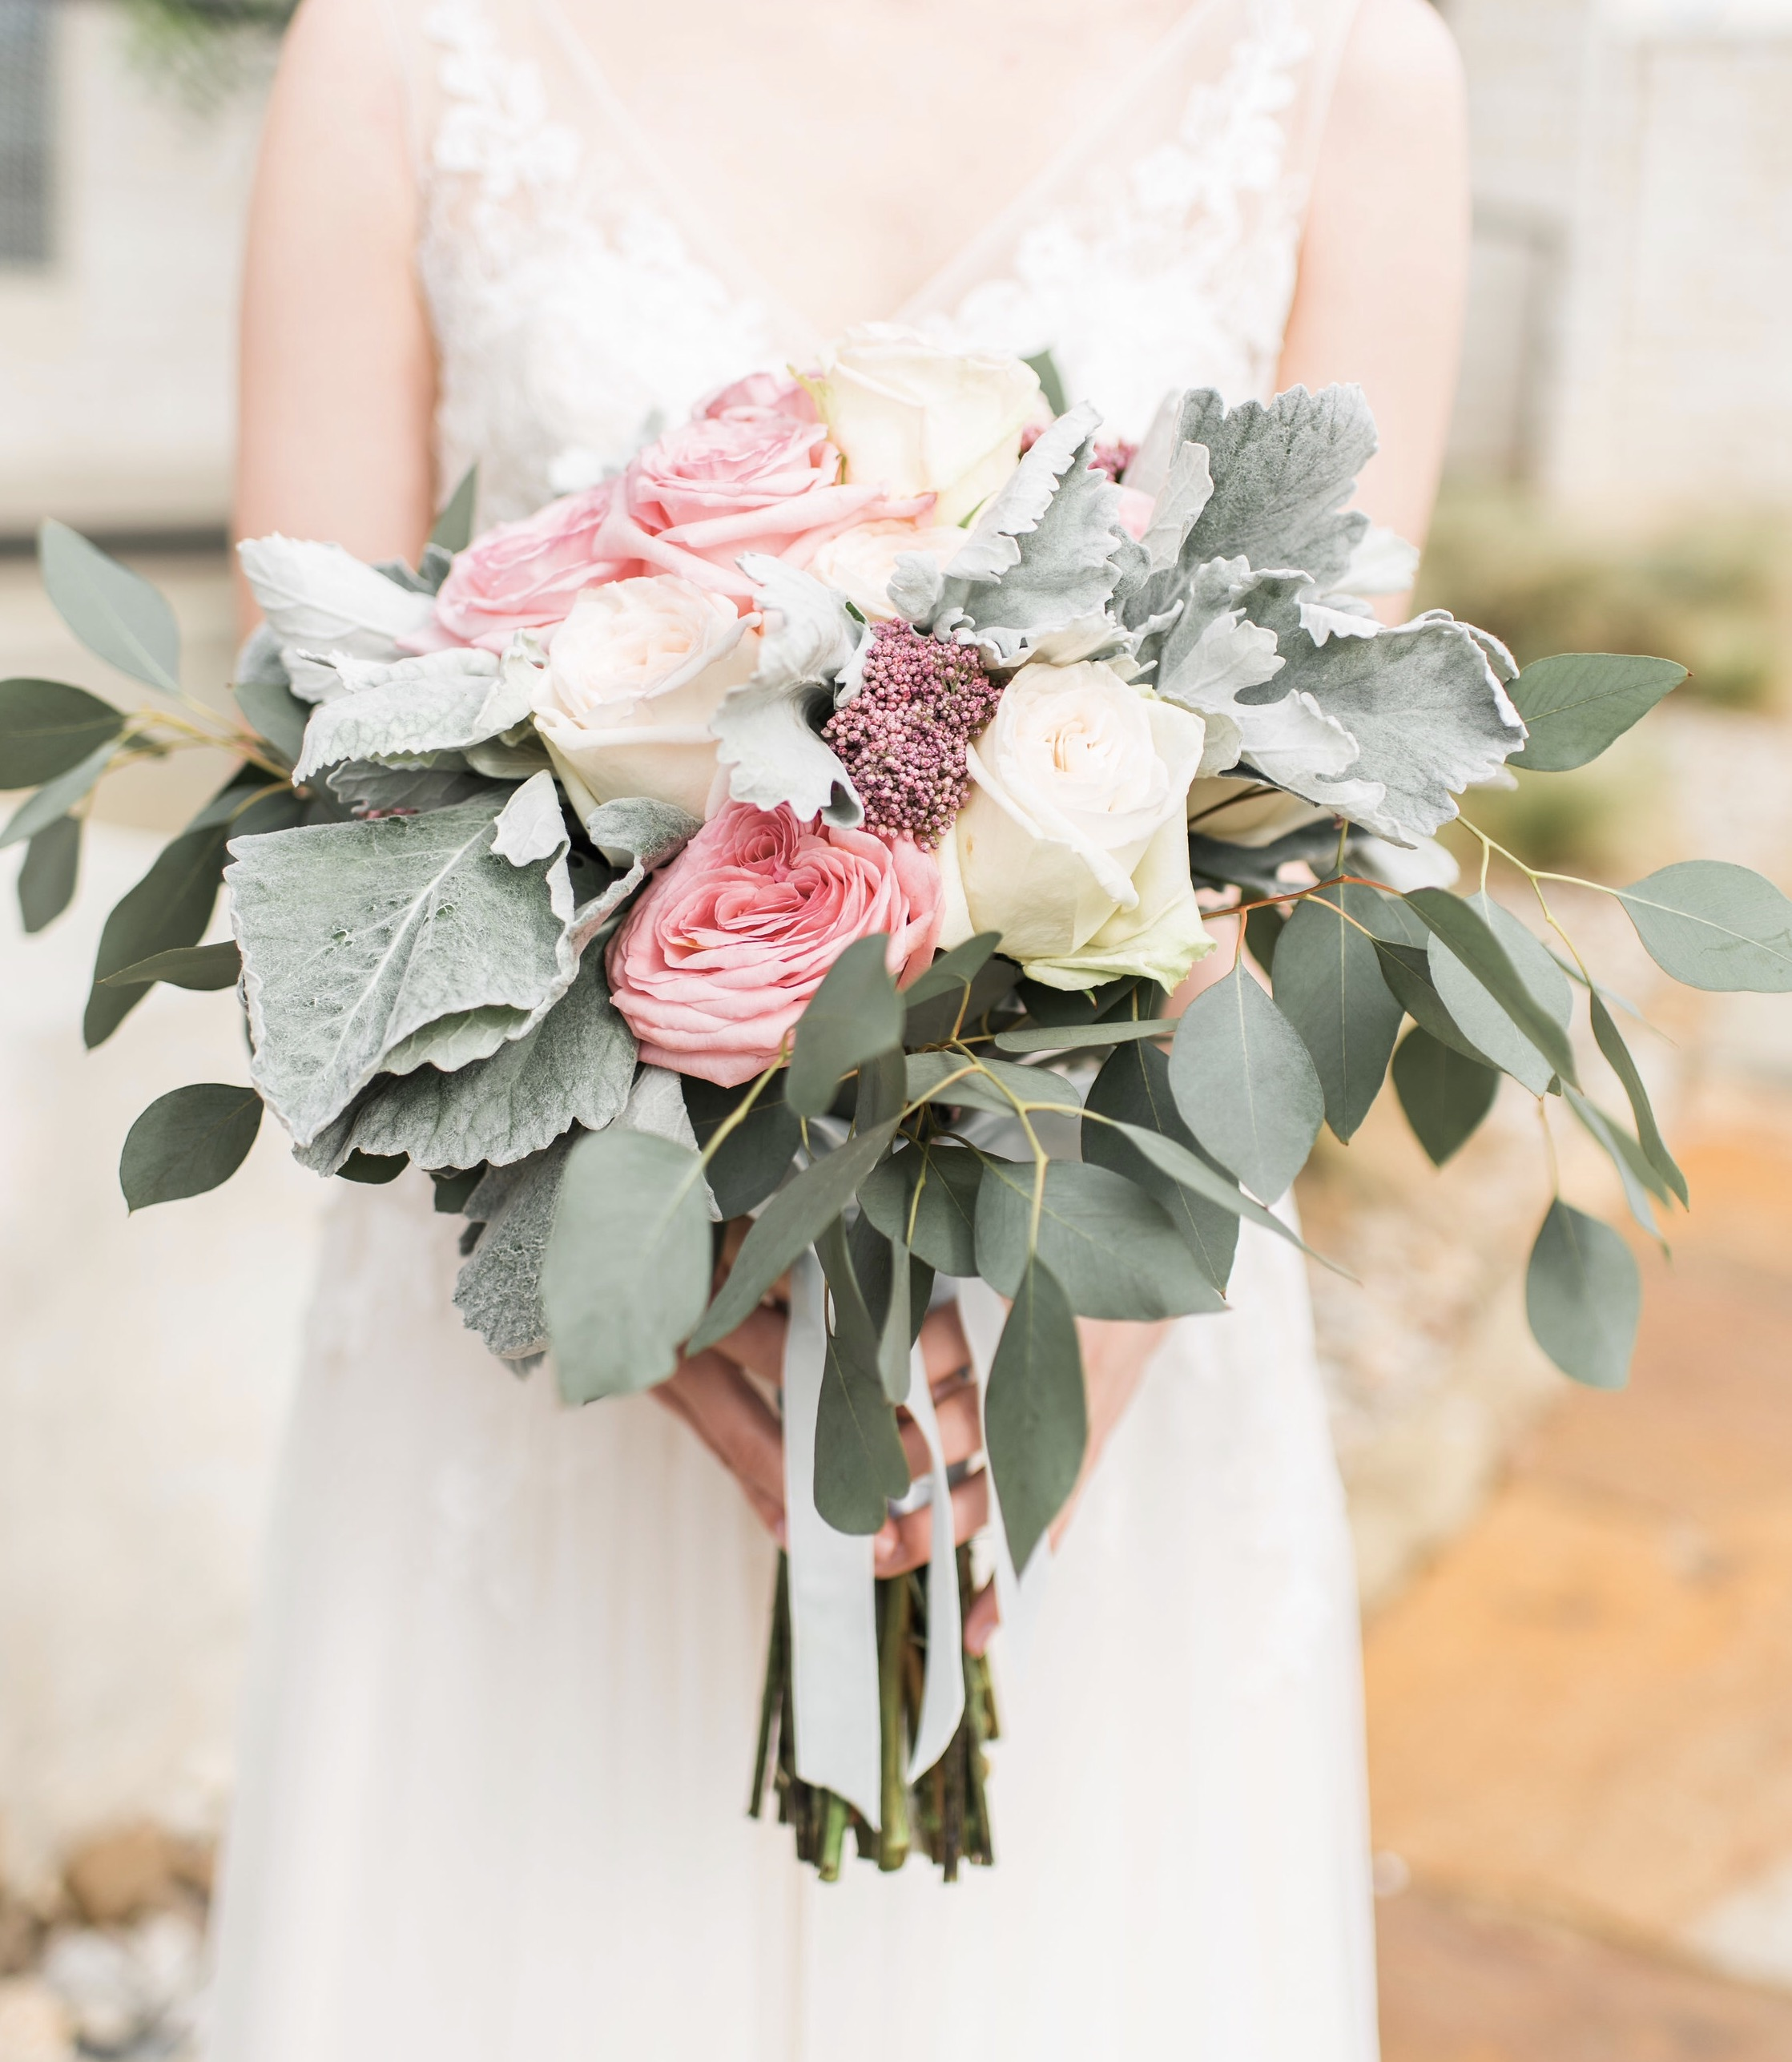 gray-door-photography-wedding-photographer-steph-erffmeyer-dallas-destination23.jpg